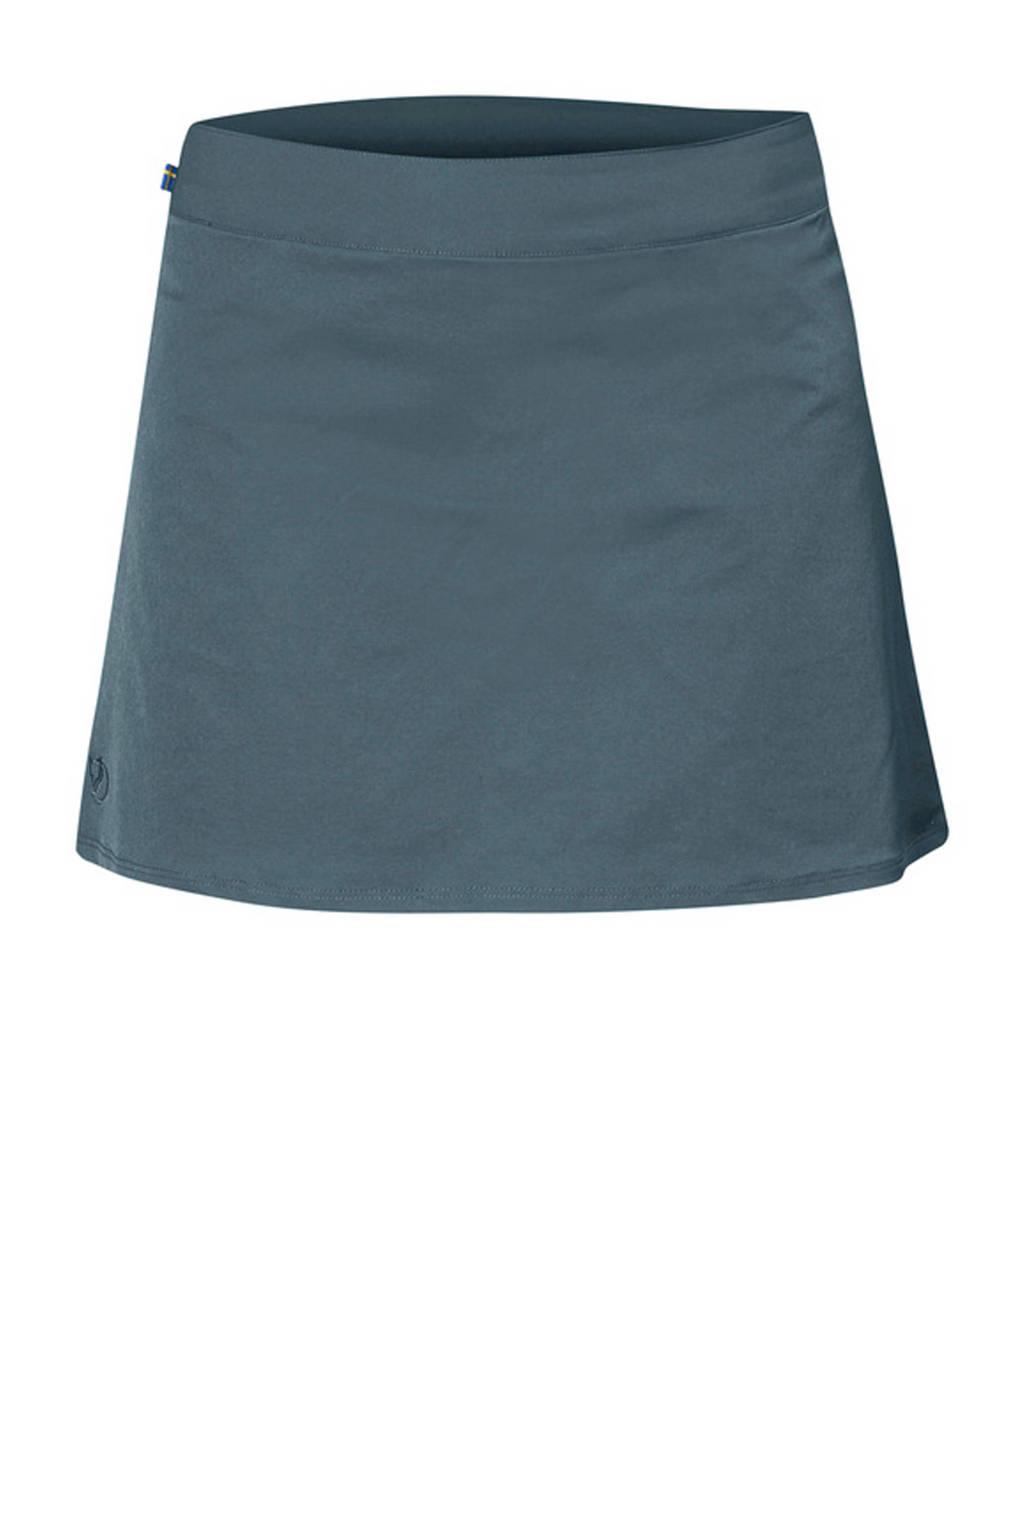 Fjällräven outdoor skort grijsblauw, Grijsblauw